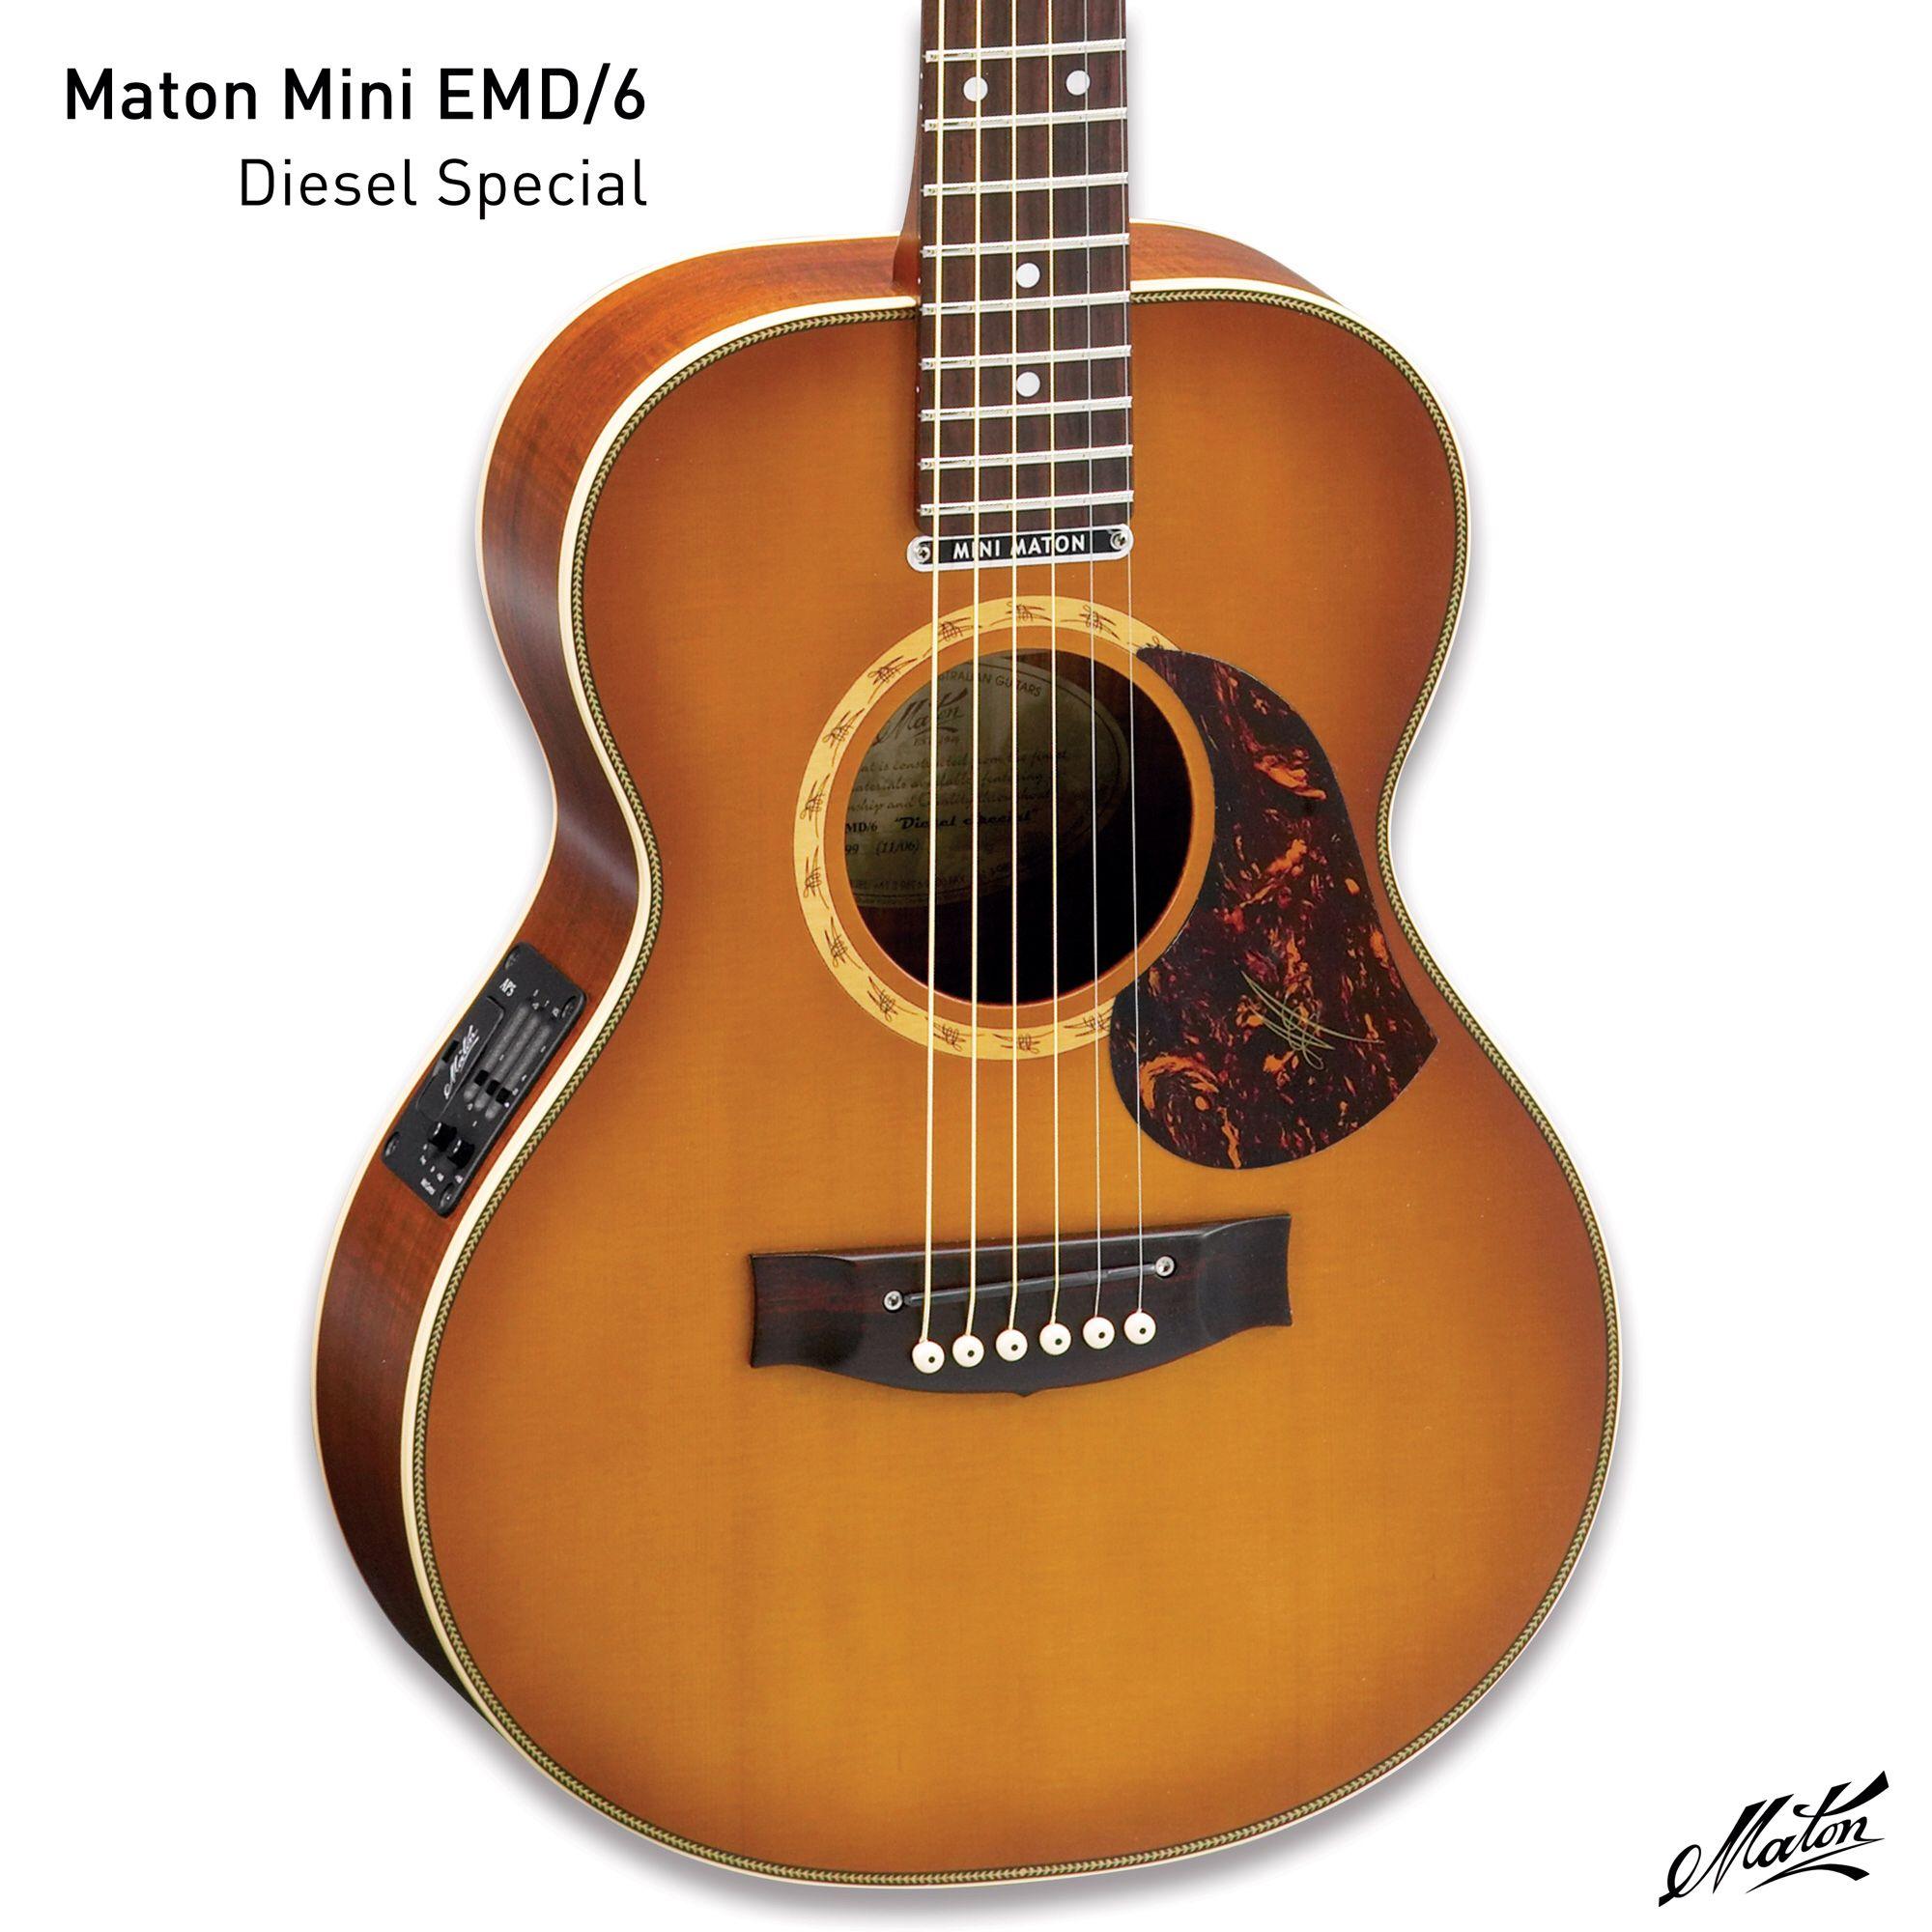 Mini Maton Emd6 Music Gear Guitar Acoustic